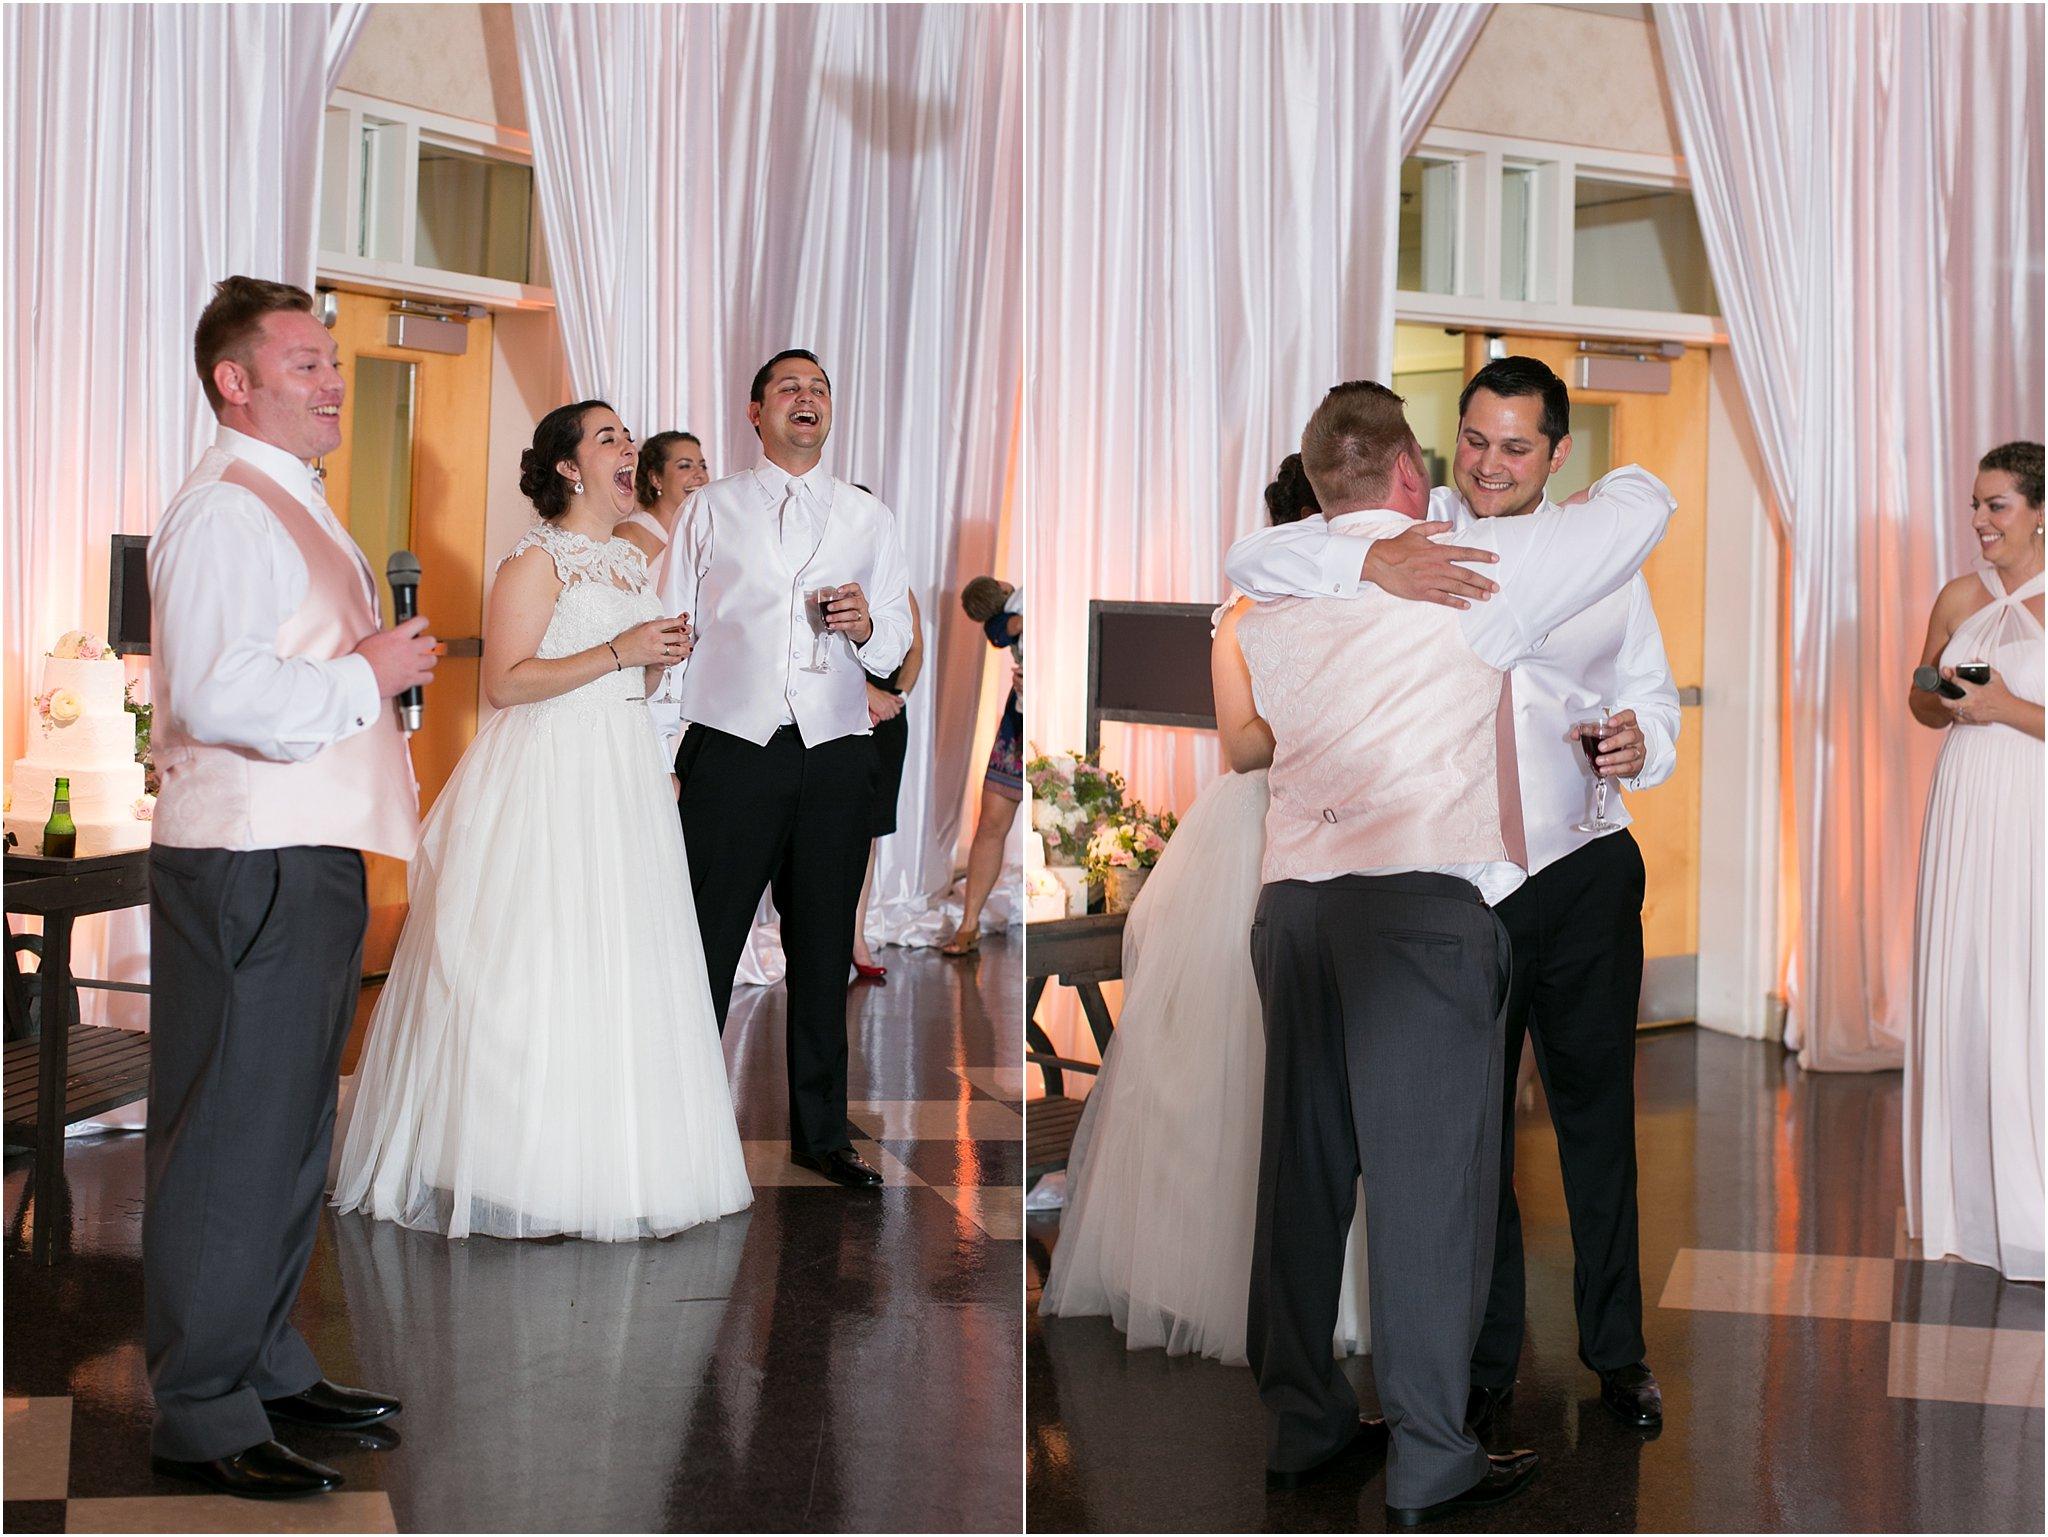 jessica_ryan_photography_virginia_wedding_photographer_wedding_hurricane_norfolk_botanical_gardens_hurricane_matthew_wedding_3638